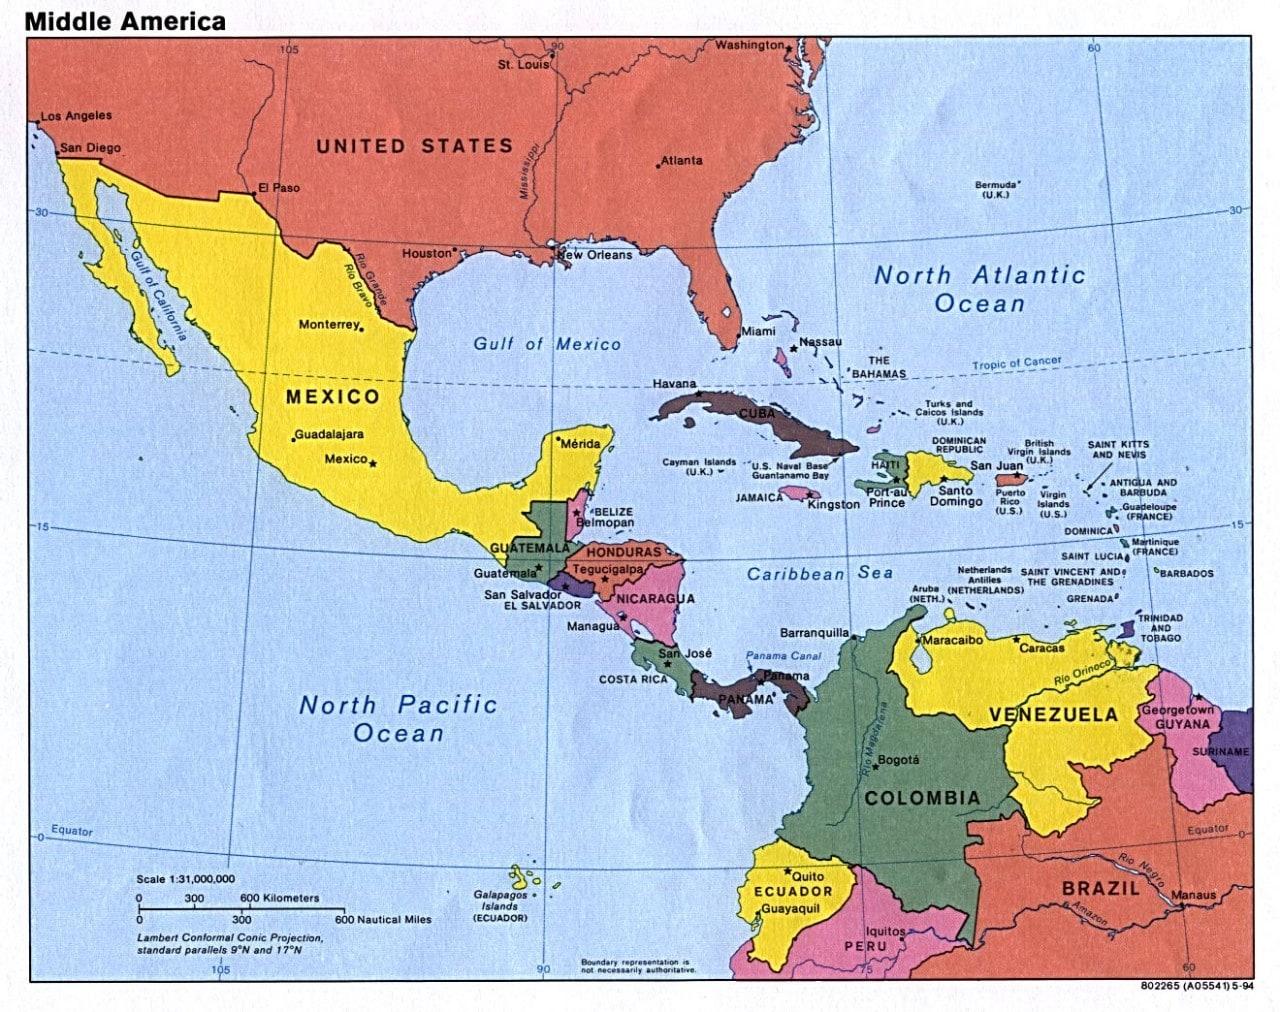 Mapa Ameryka Srodkowa Travelin Travelin